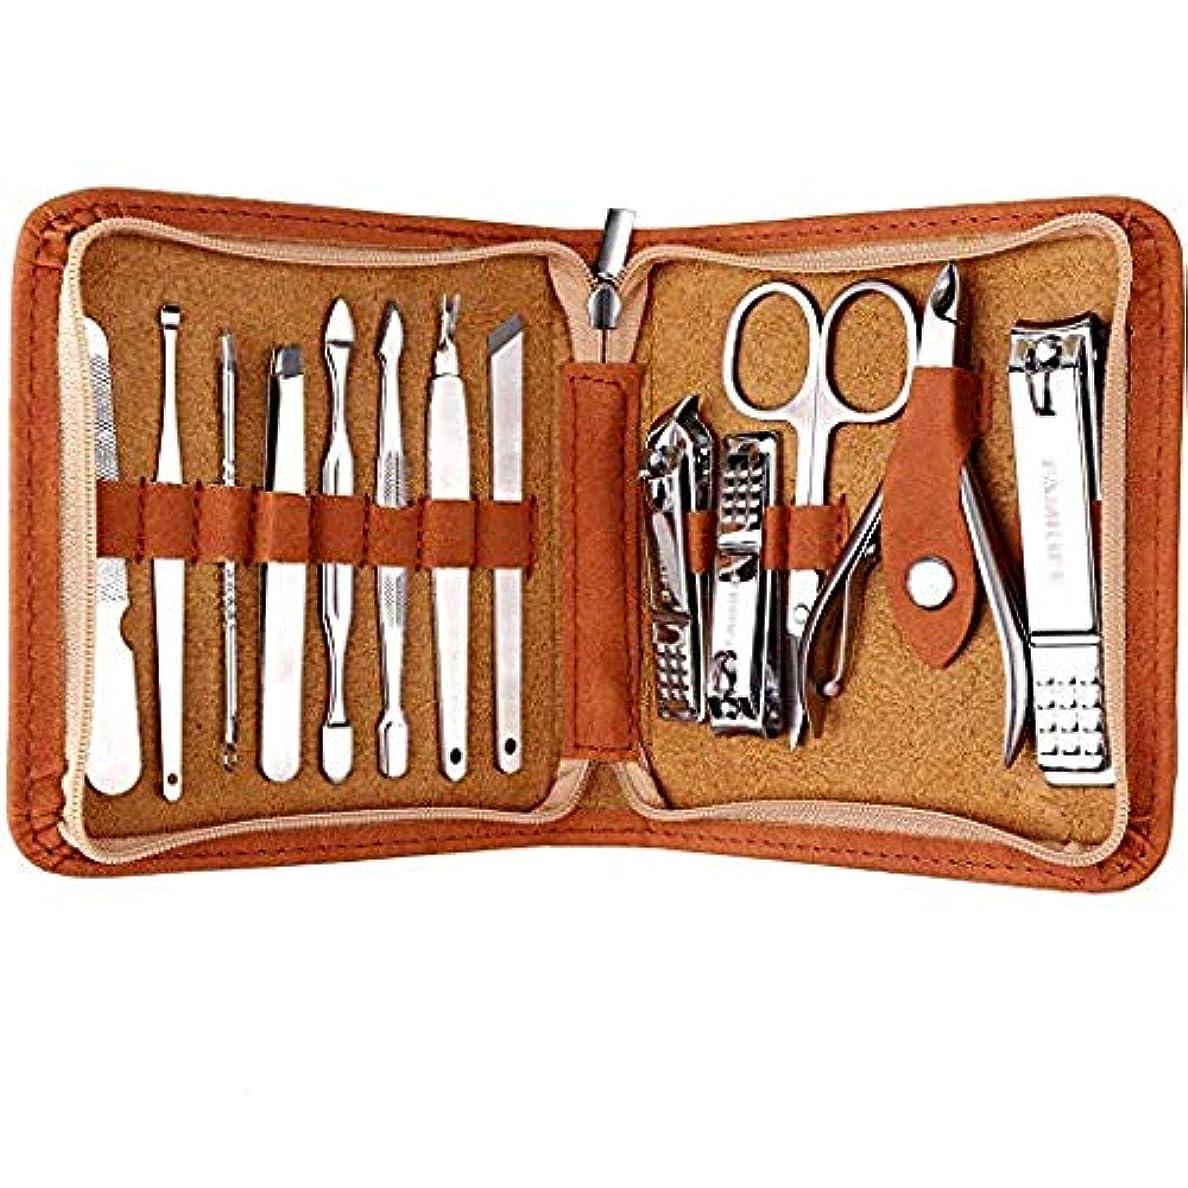 FAMILIFE 爪切りセット ネイルニッパー マニキュアセット 爪切り ネイルケア 携帯便利グルーミング キット レザーケース付き 13点爪きりセット 男女兼用